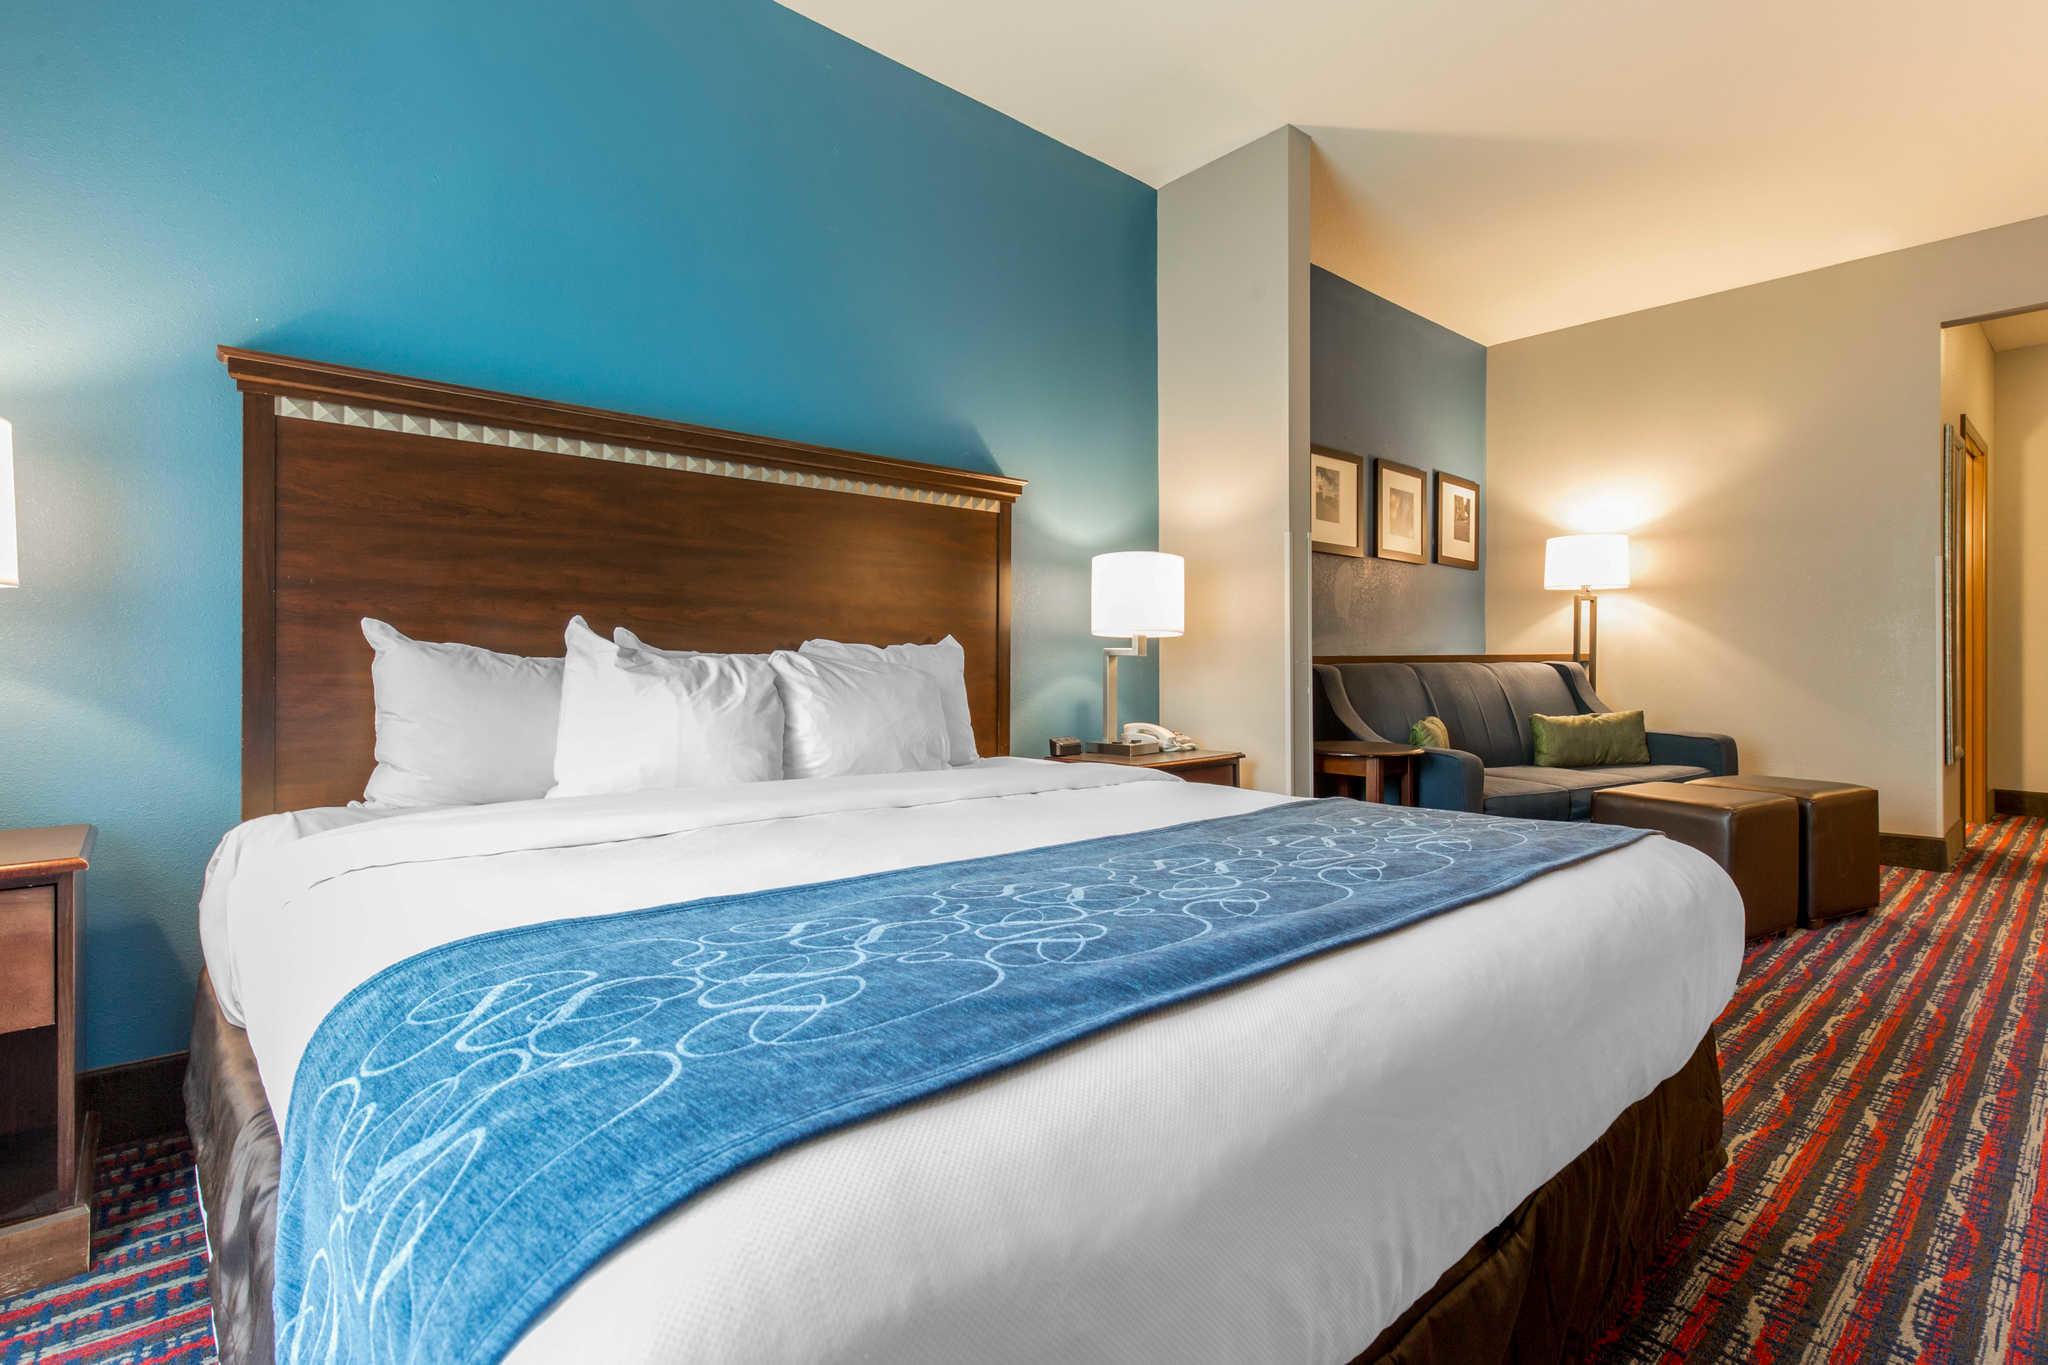 Comfort Suites image 0